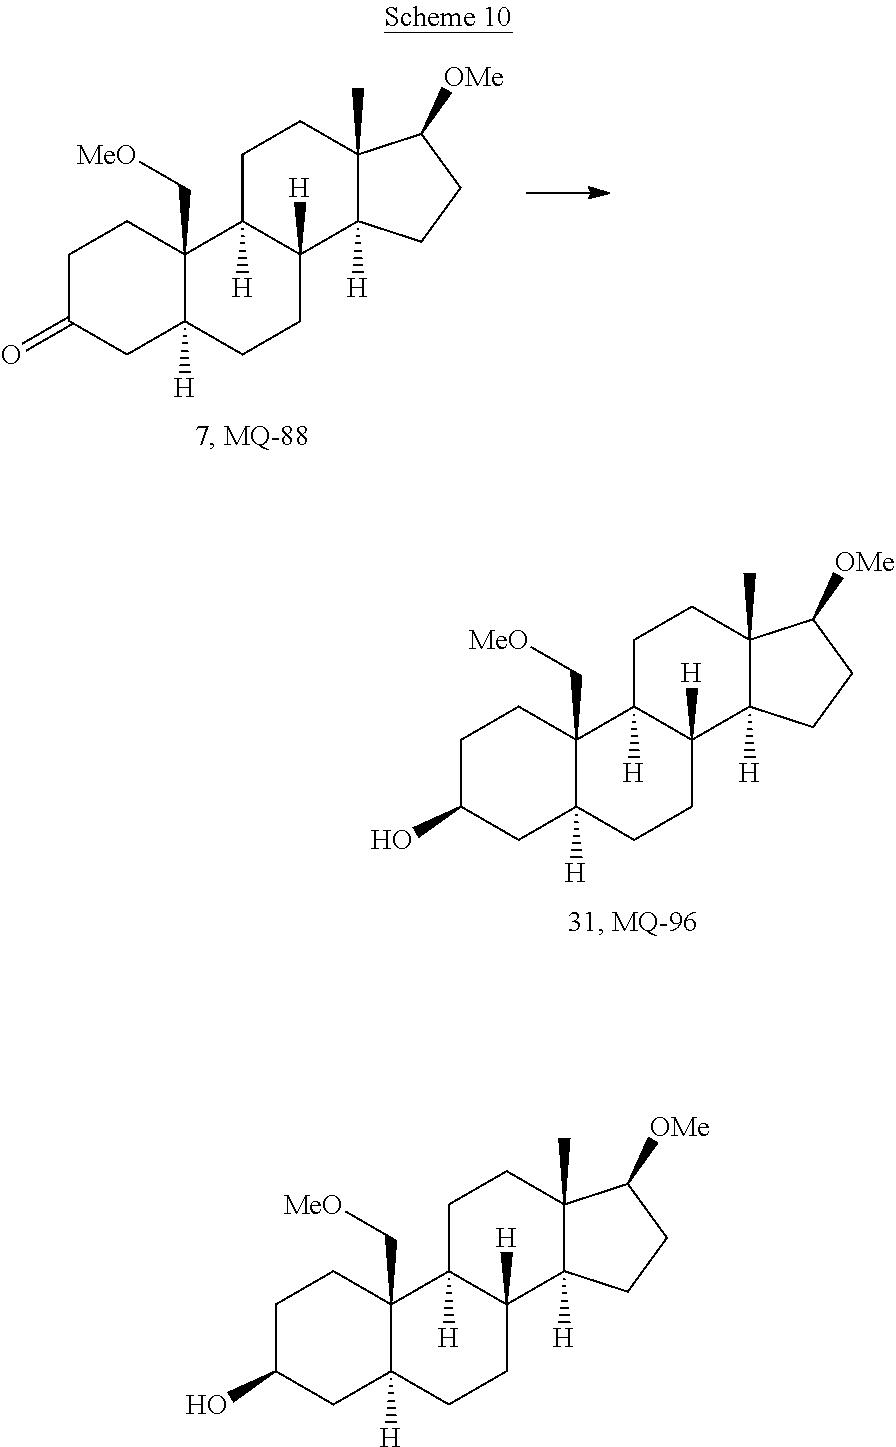 US9676812B2 - Neuroactive 19-alkoxy-17-substituted steroids